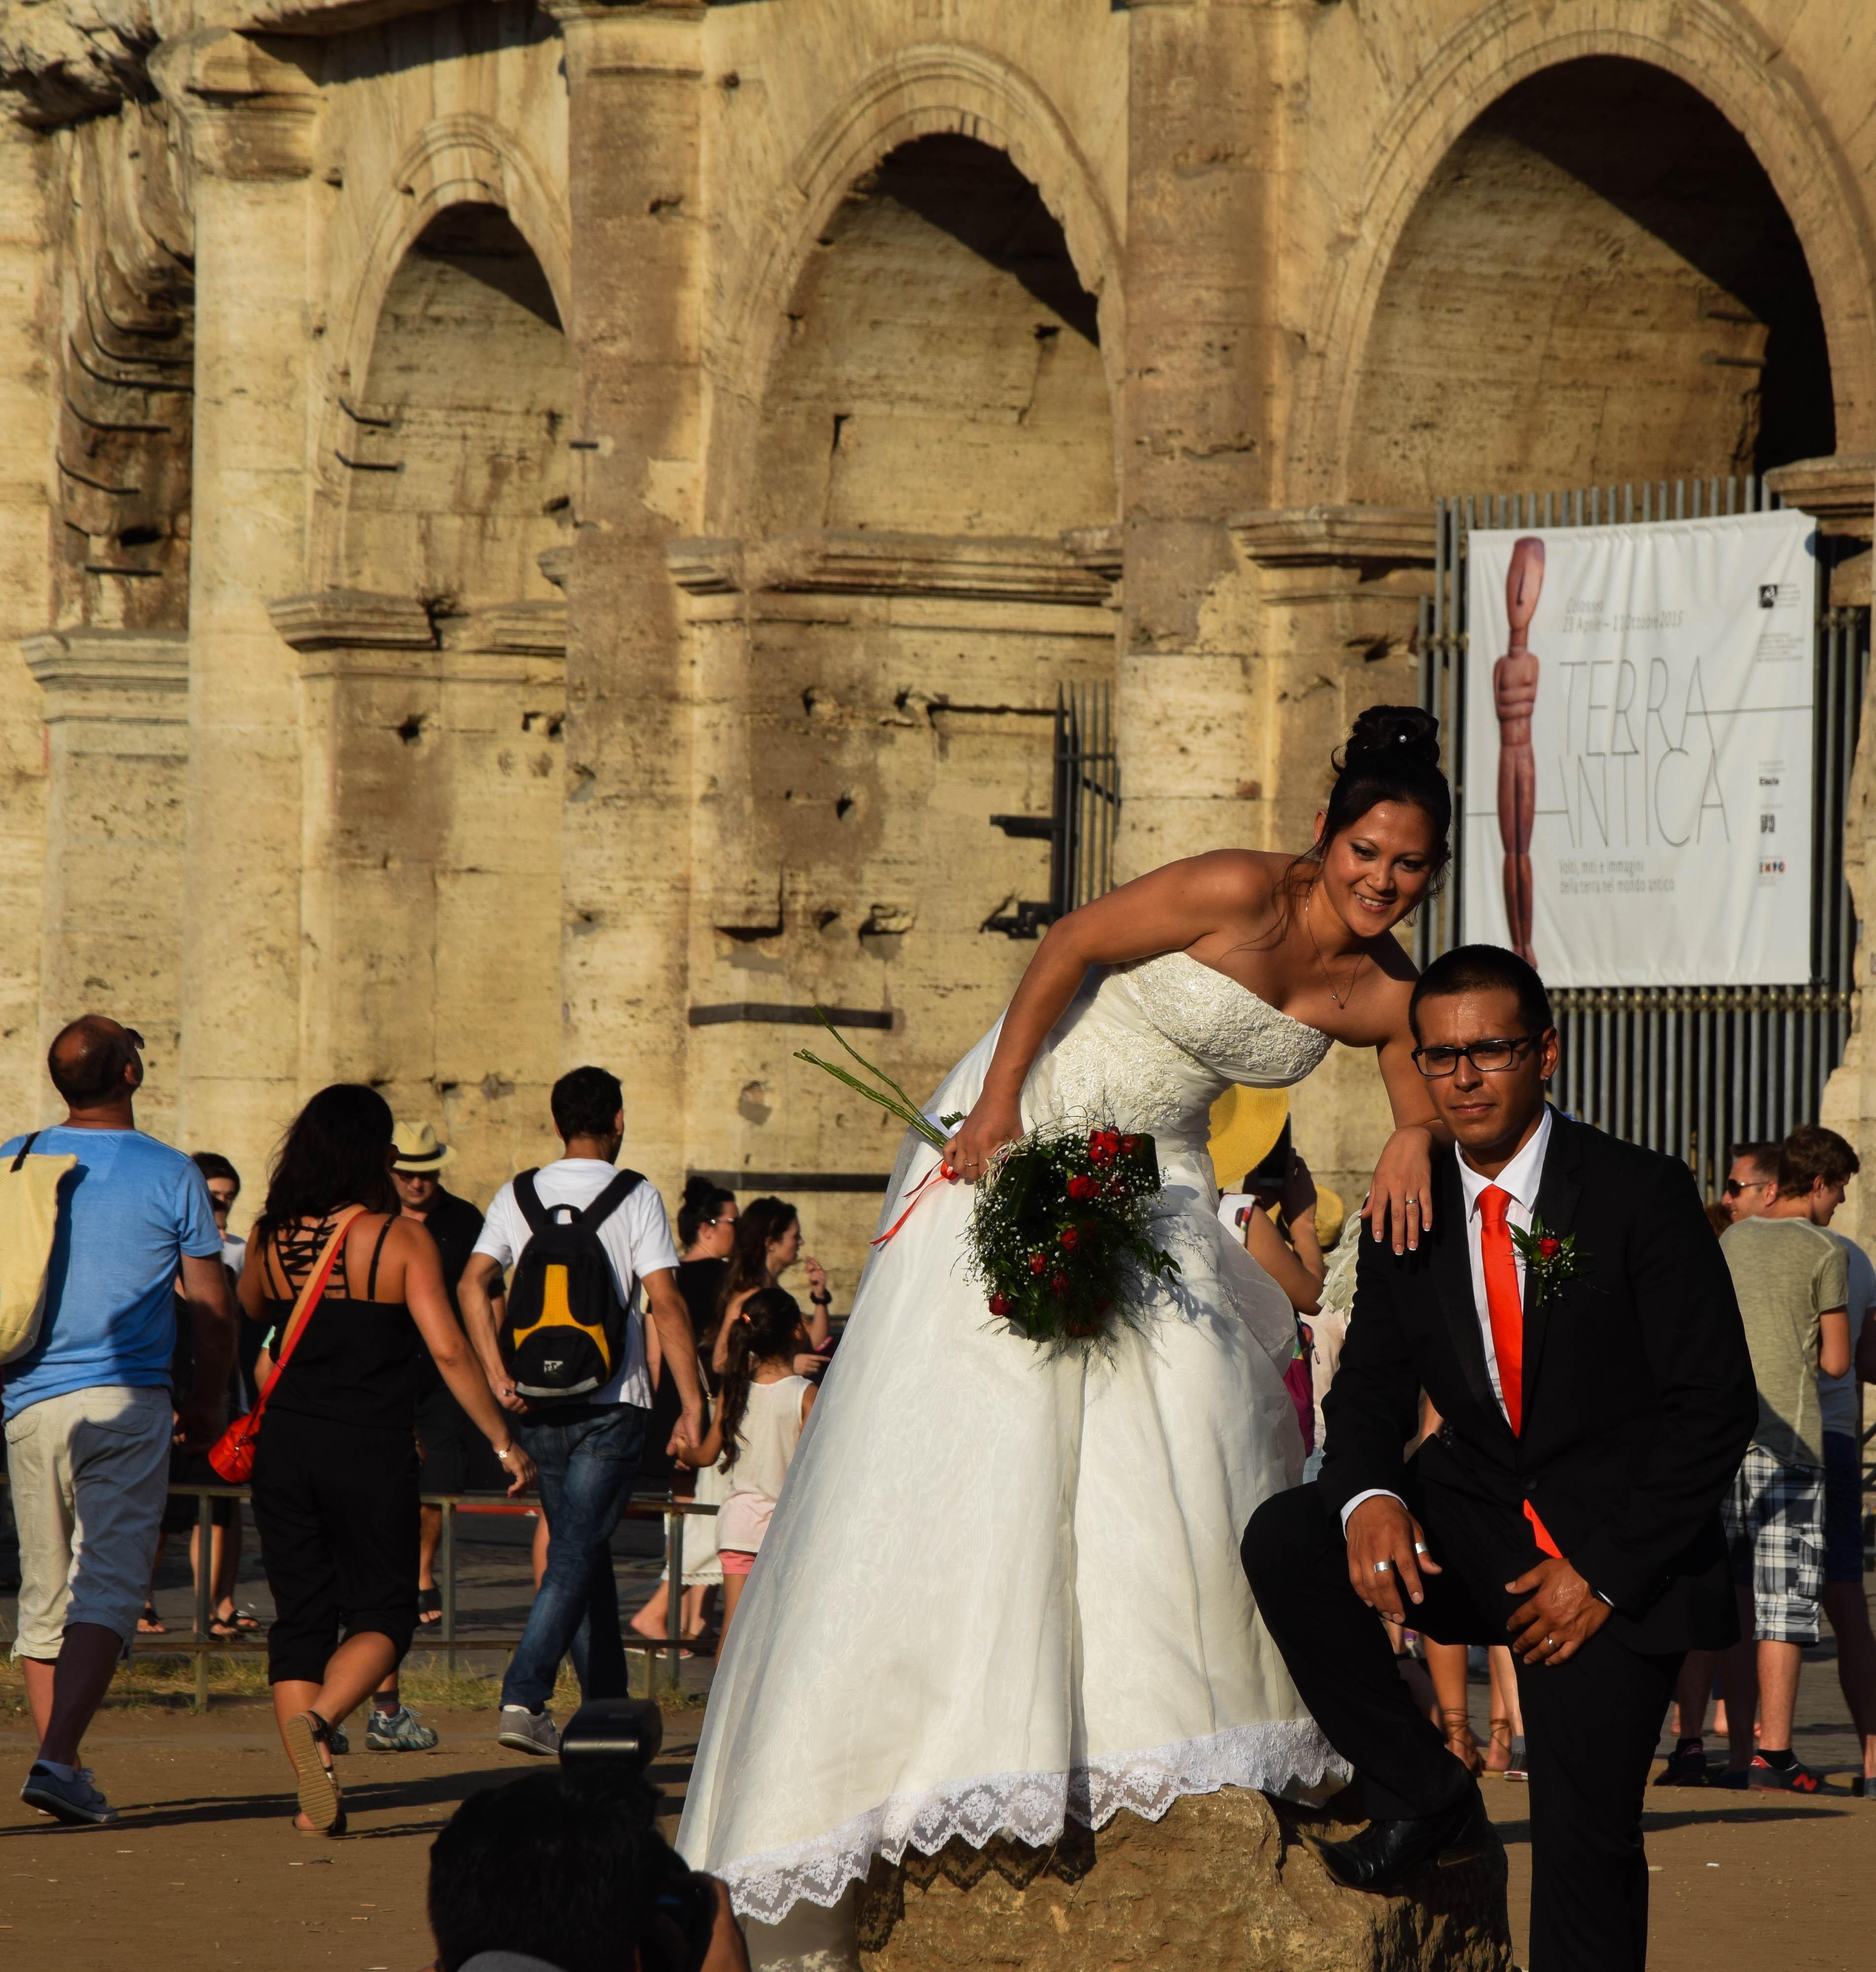 Matrimonio In Roma Antica : Sfondi italia architettura antico europa roma matrimonio